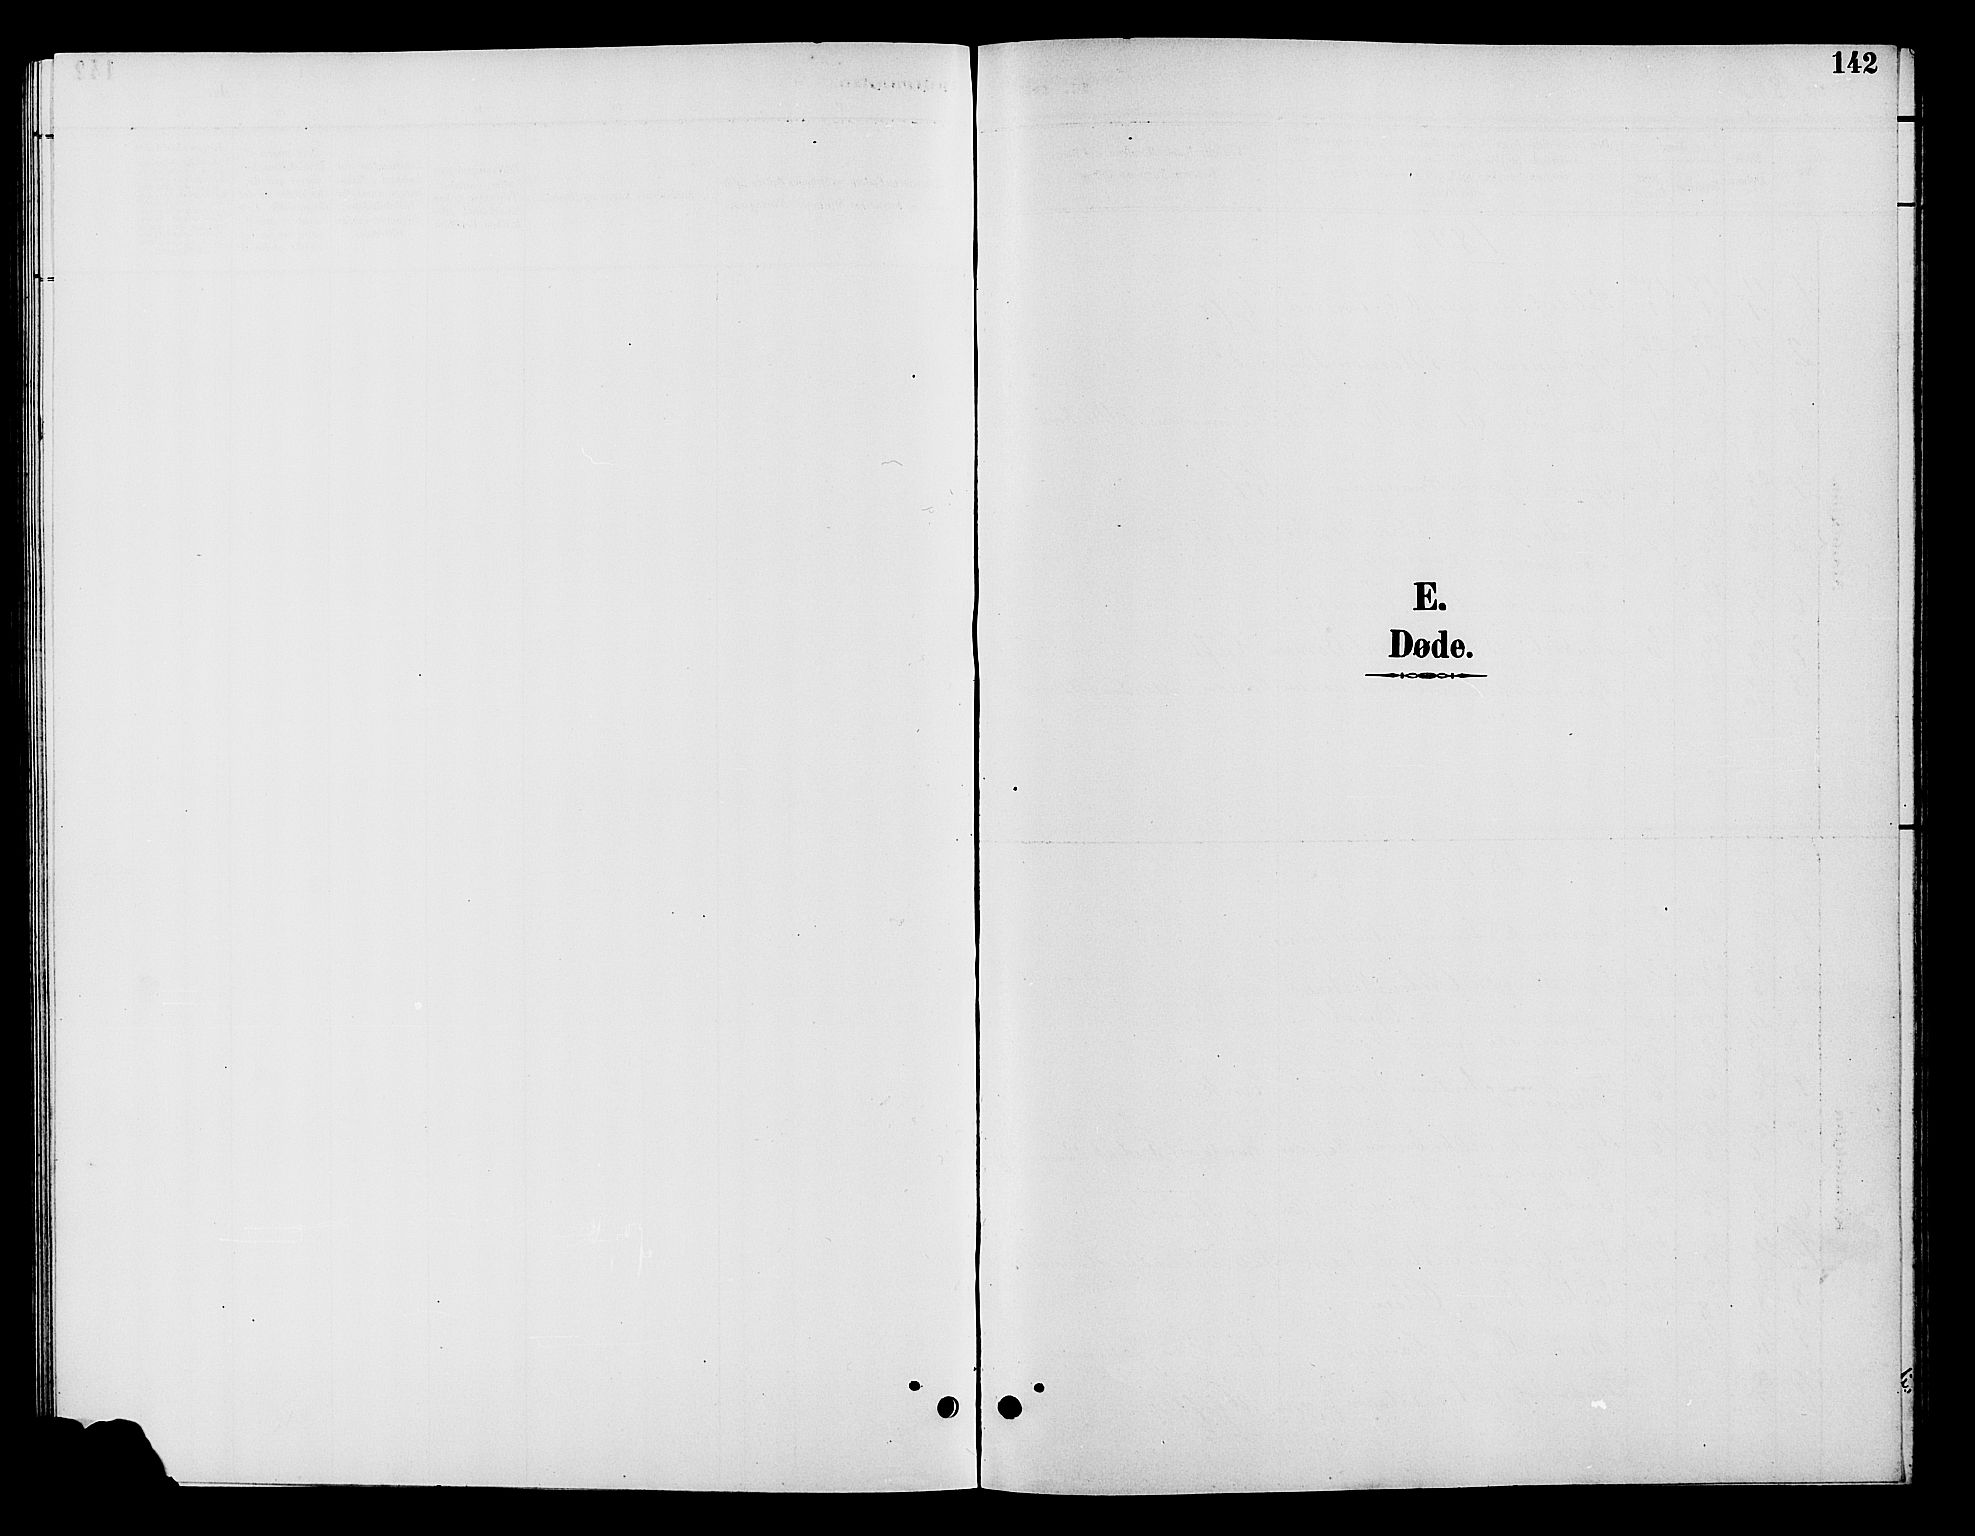 SAH, Vardal prestekontor, H/Ha/Hab/L0009: Klokkerbok nr. 9, 1894-1902, s. 142